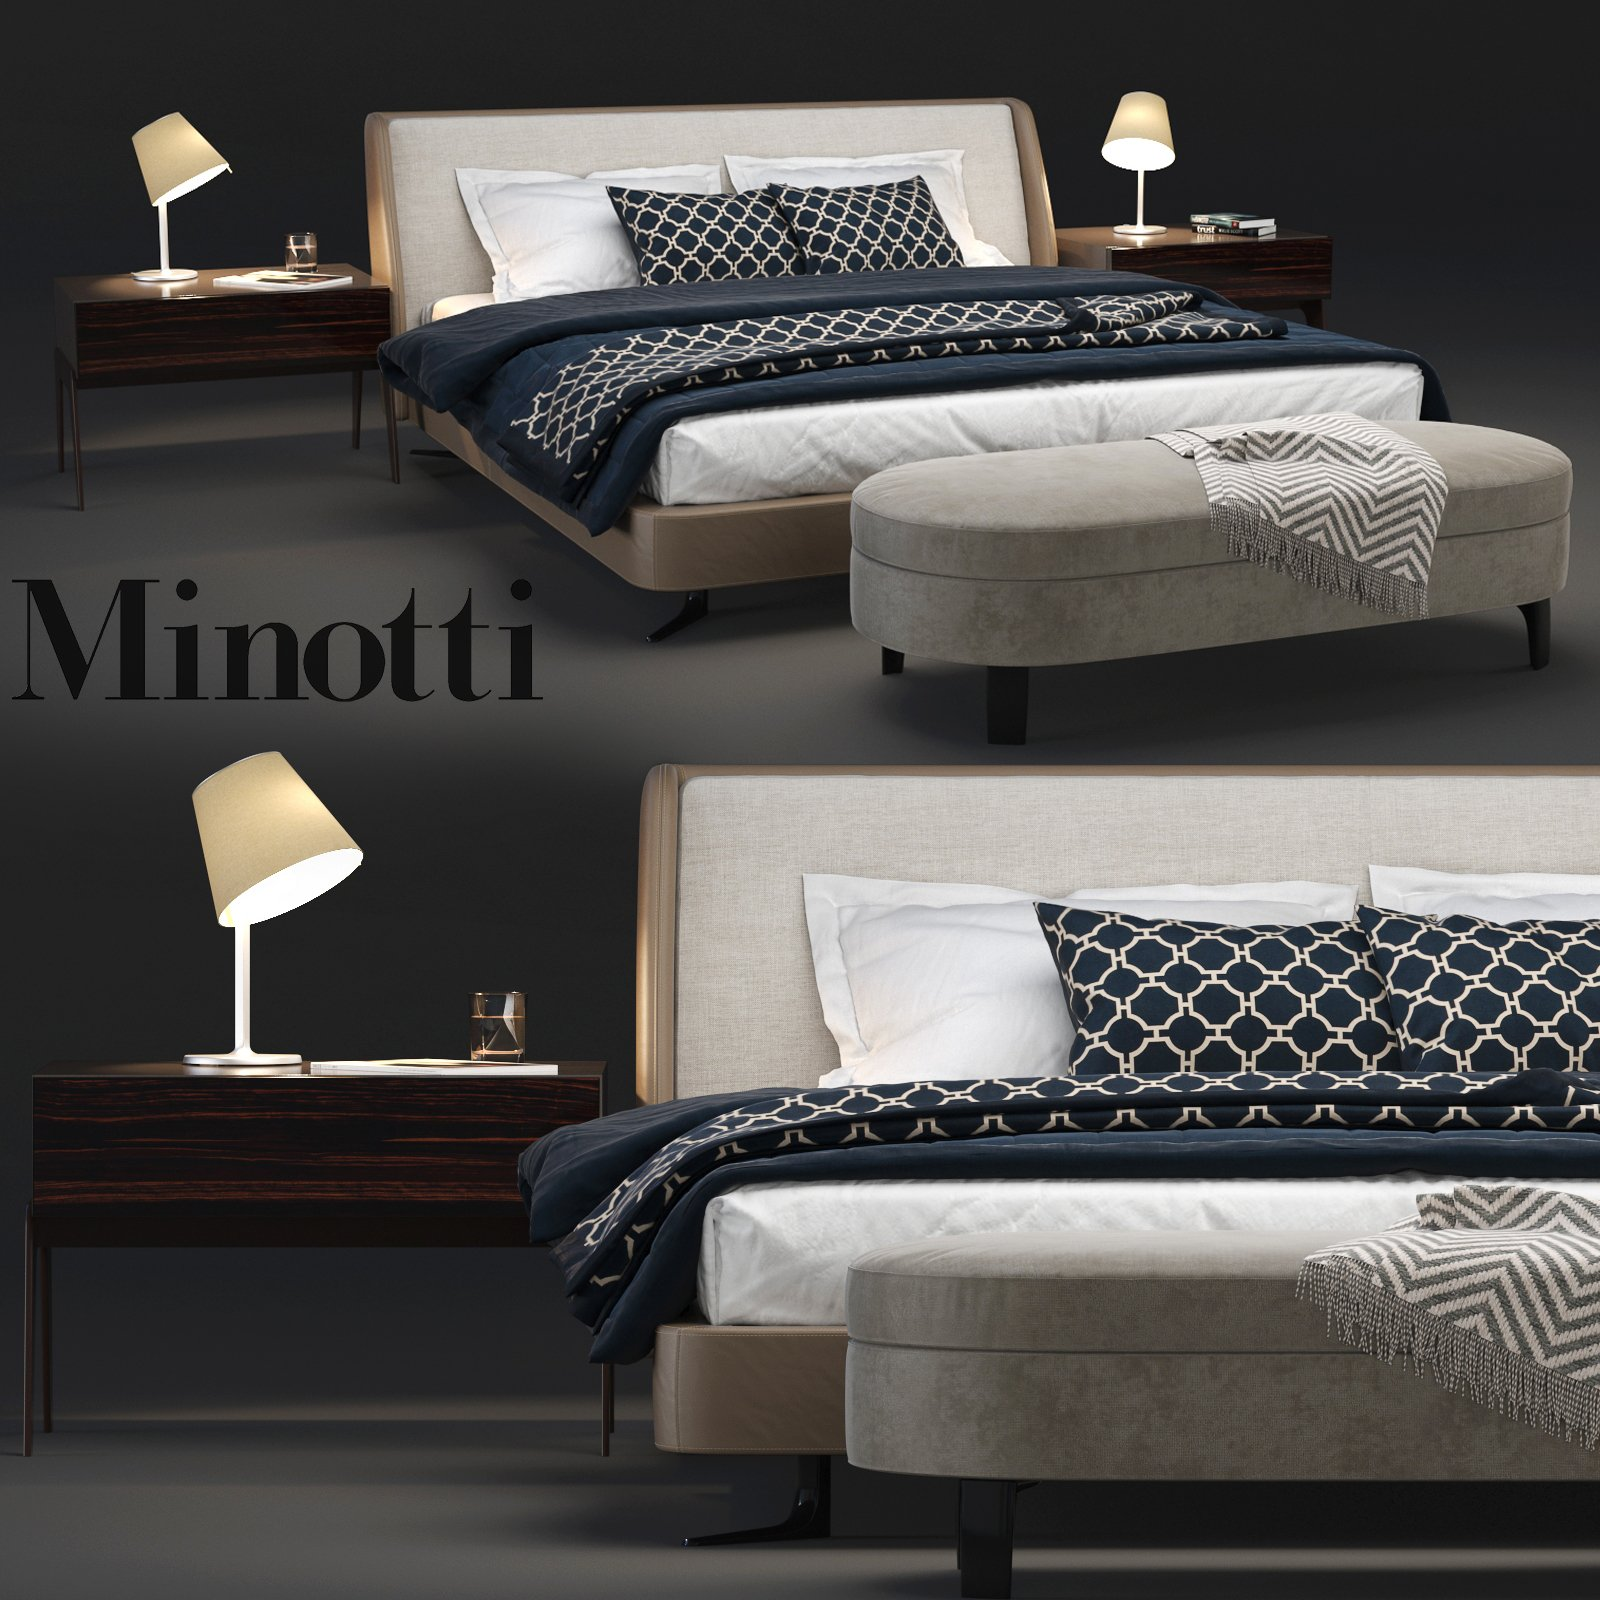 Minotti Spencer Bedroom Set High Quality 3ds Max 3d Models Creative Market